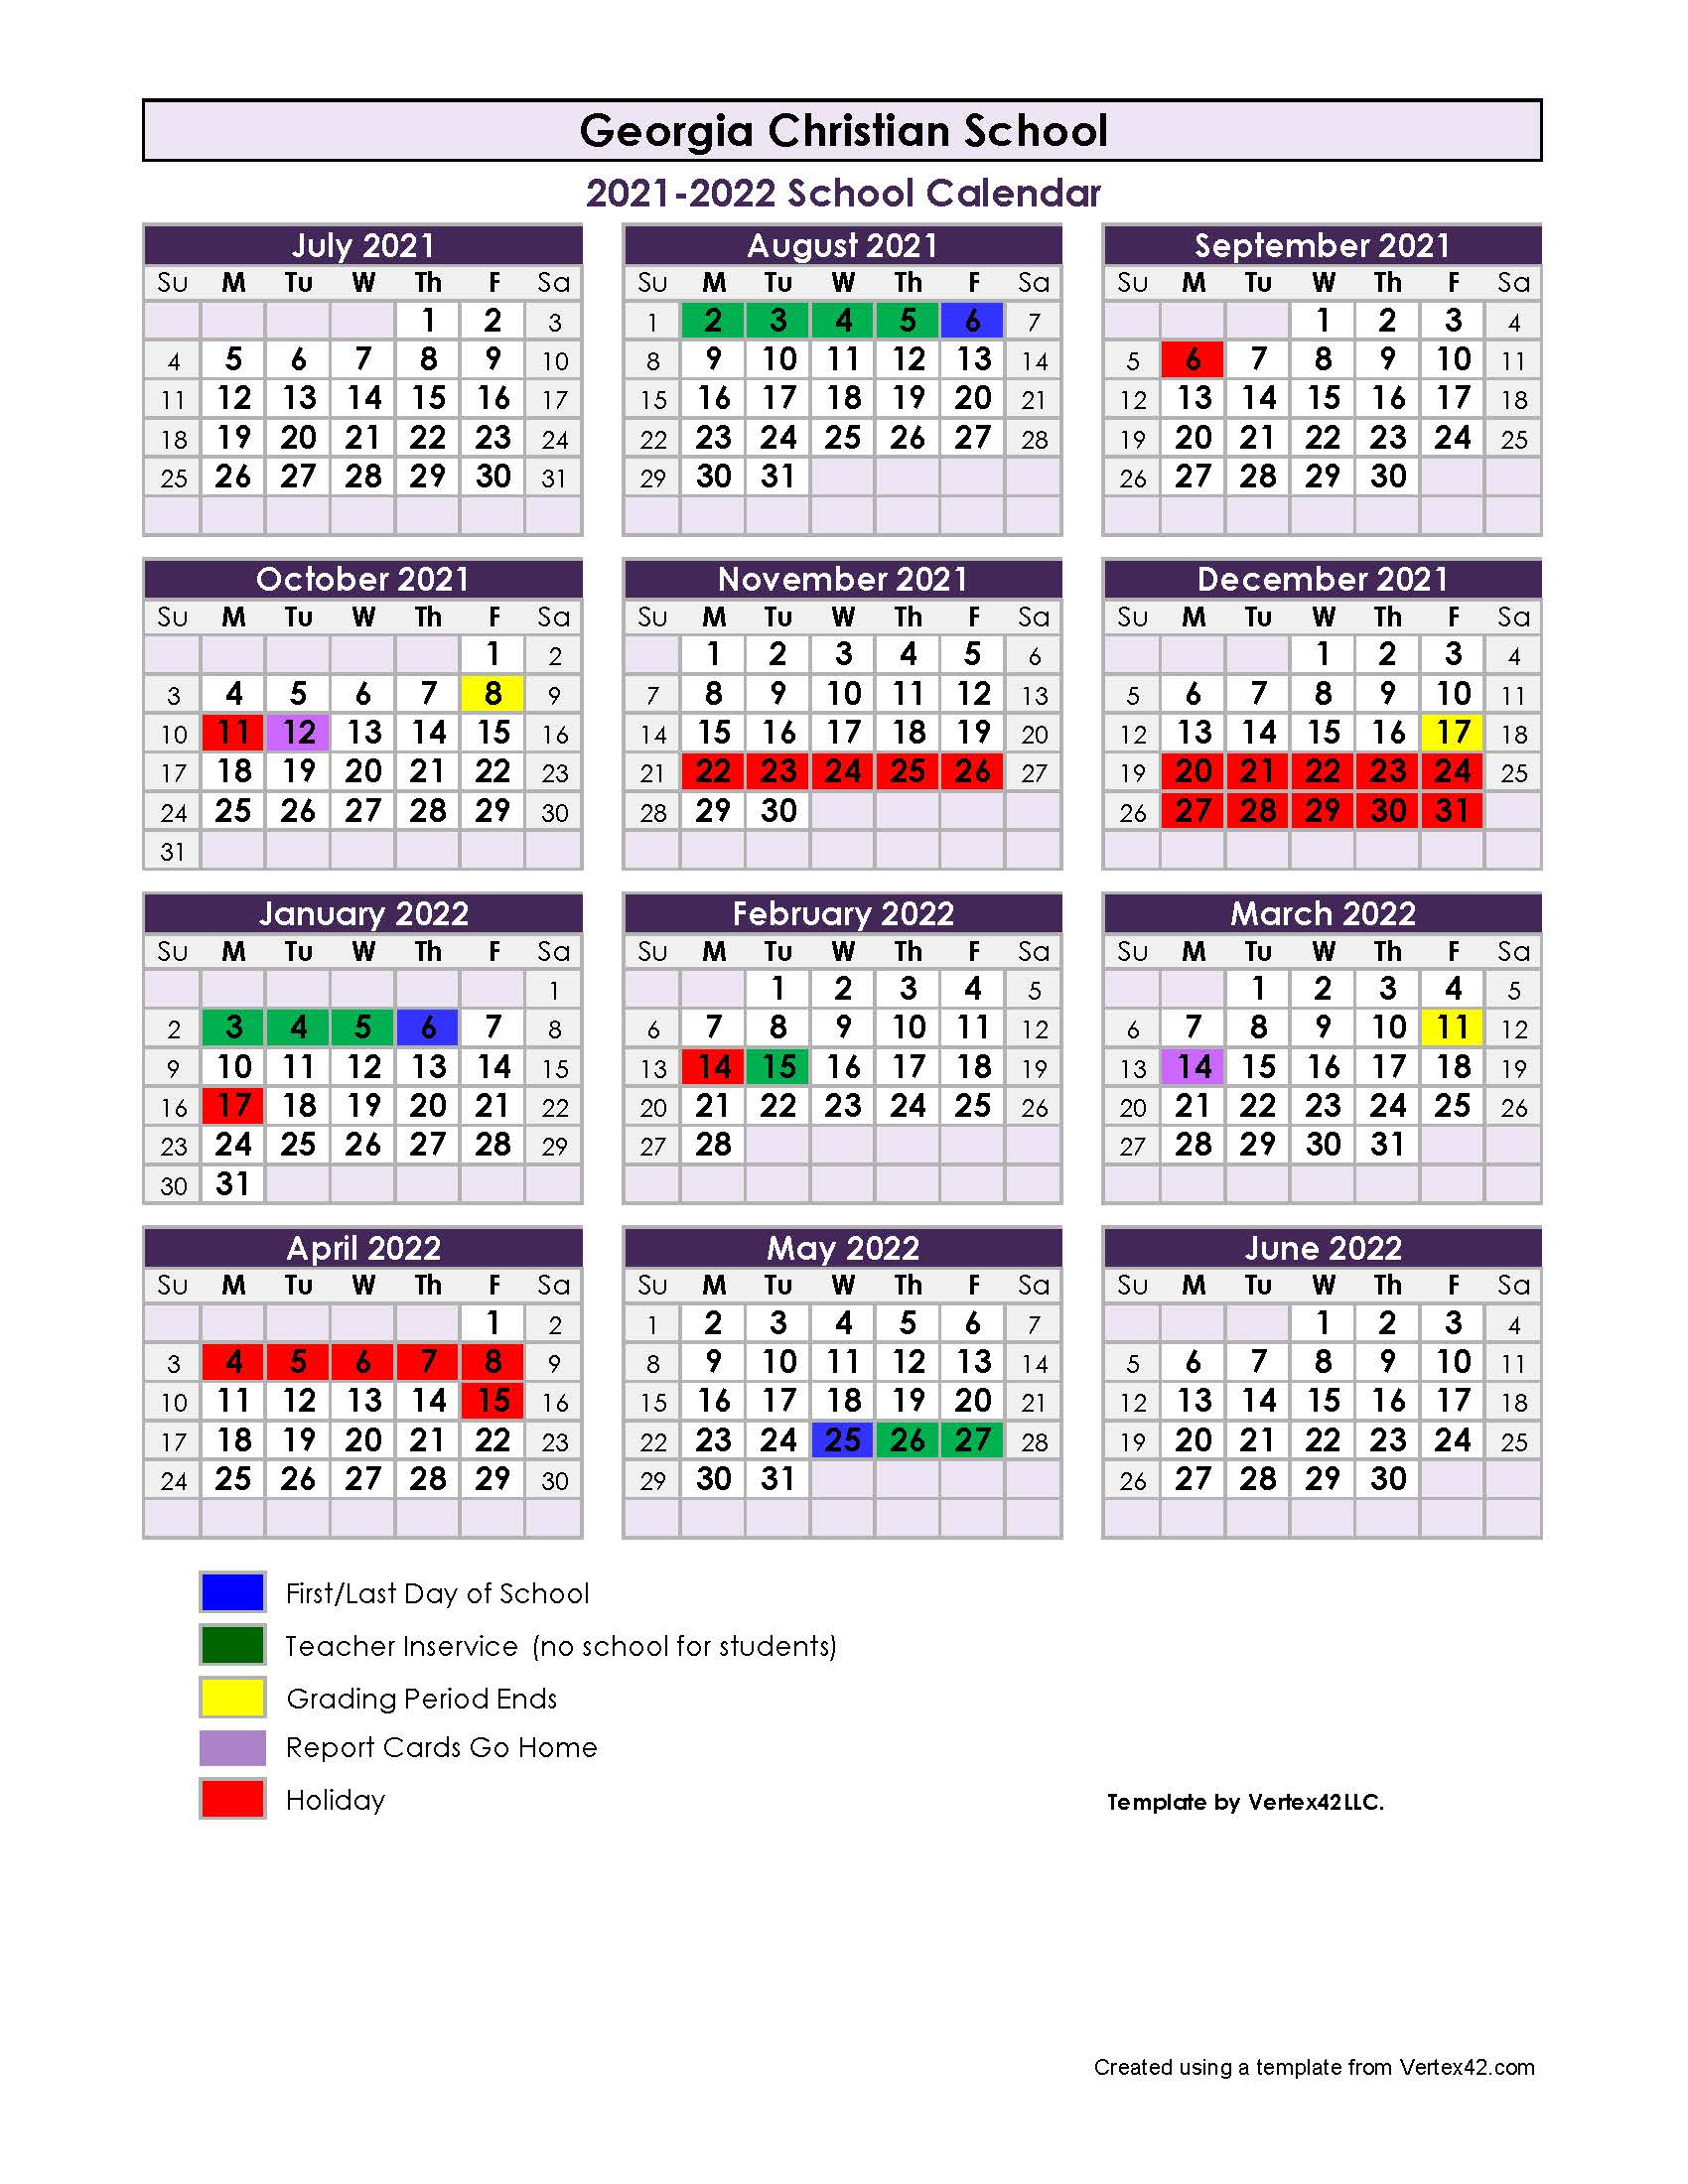 202122 School Calendar  Georgia Christian School pertaining to Uga School Calendar